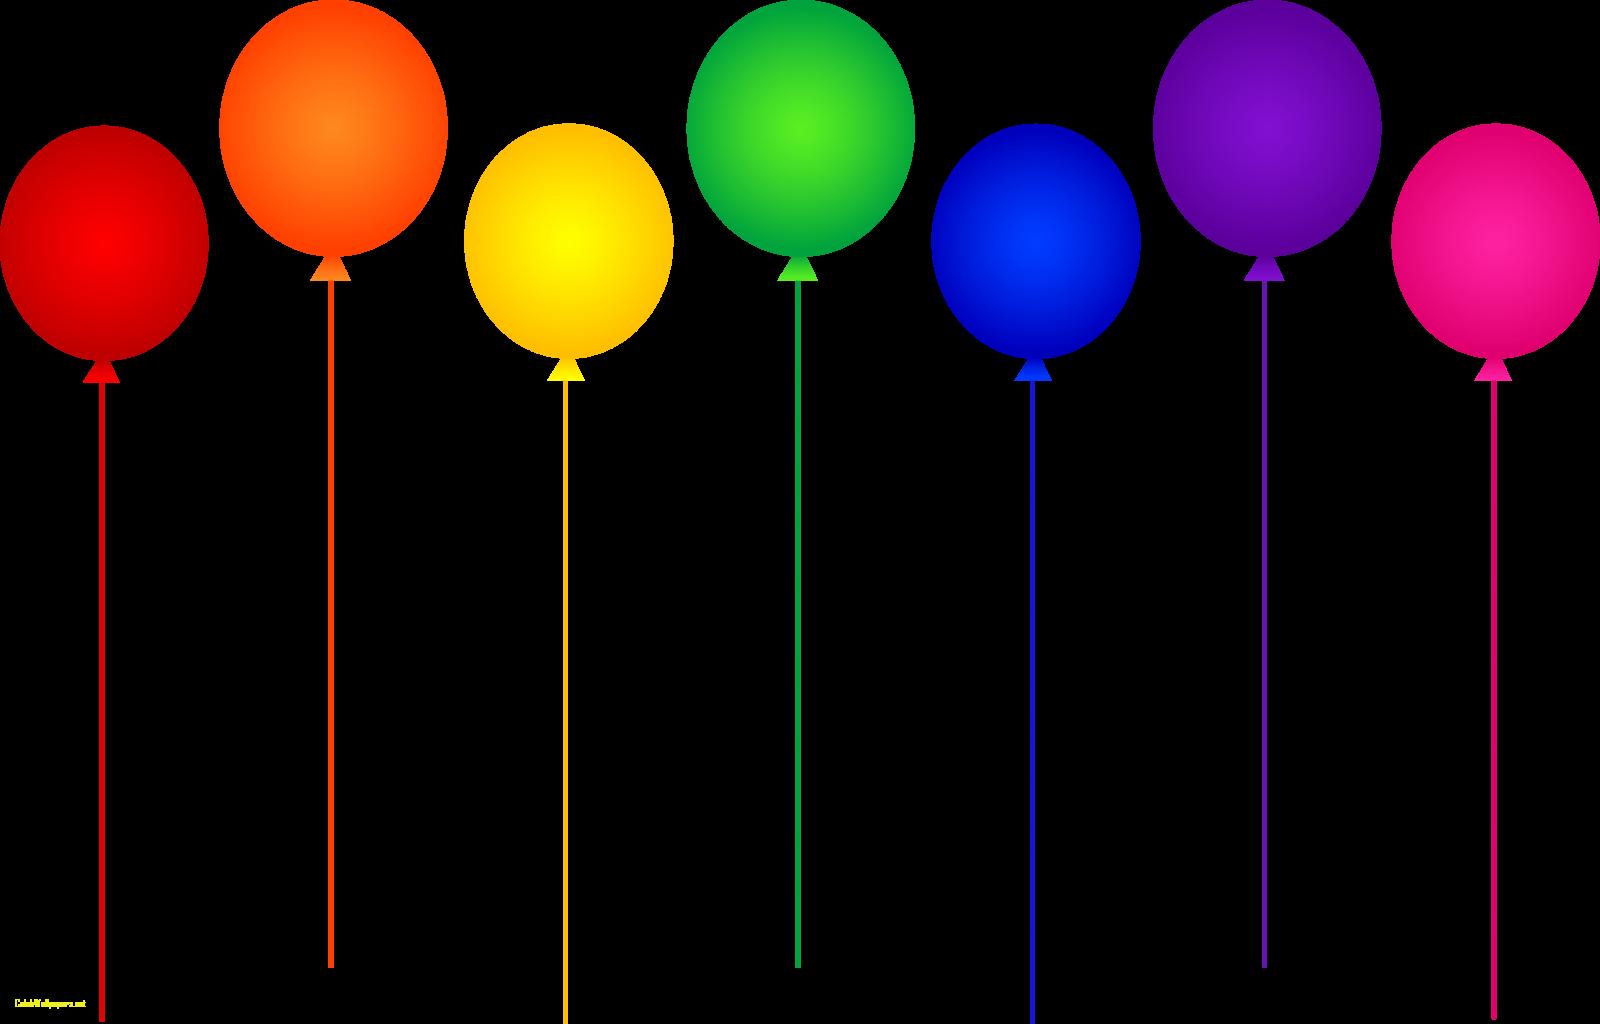 7 clipart balloon. Balloons images birthday free